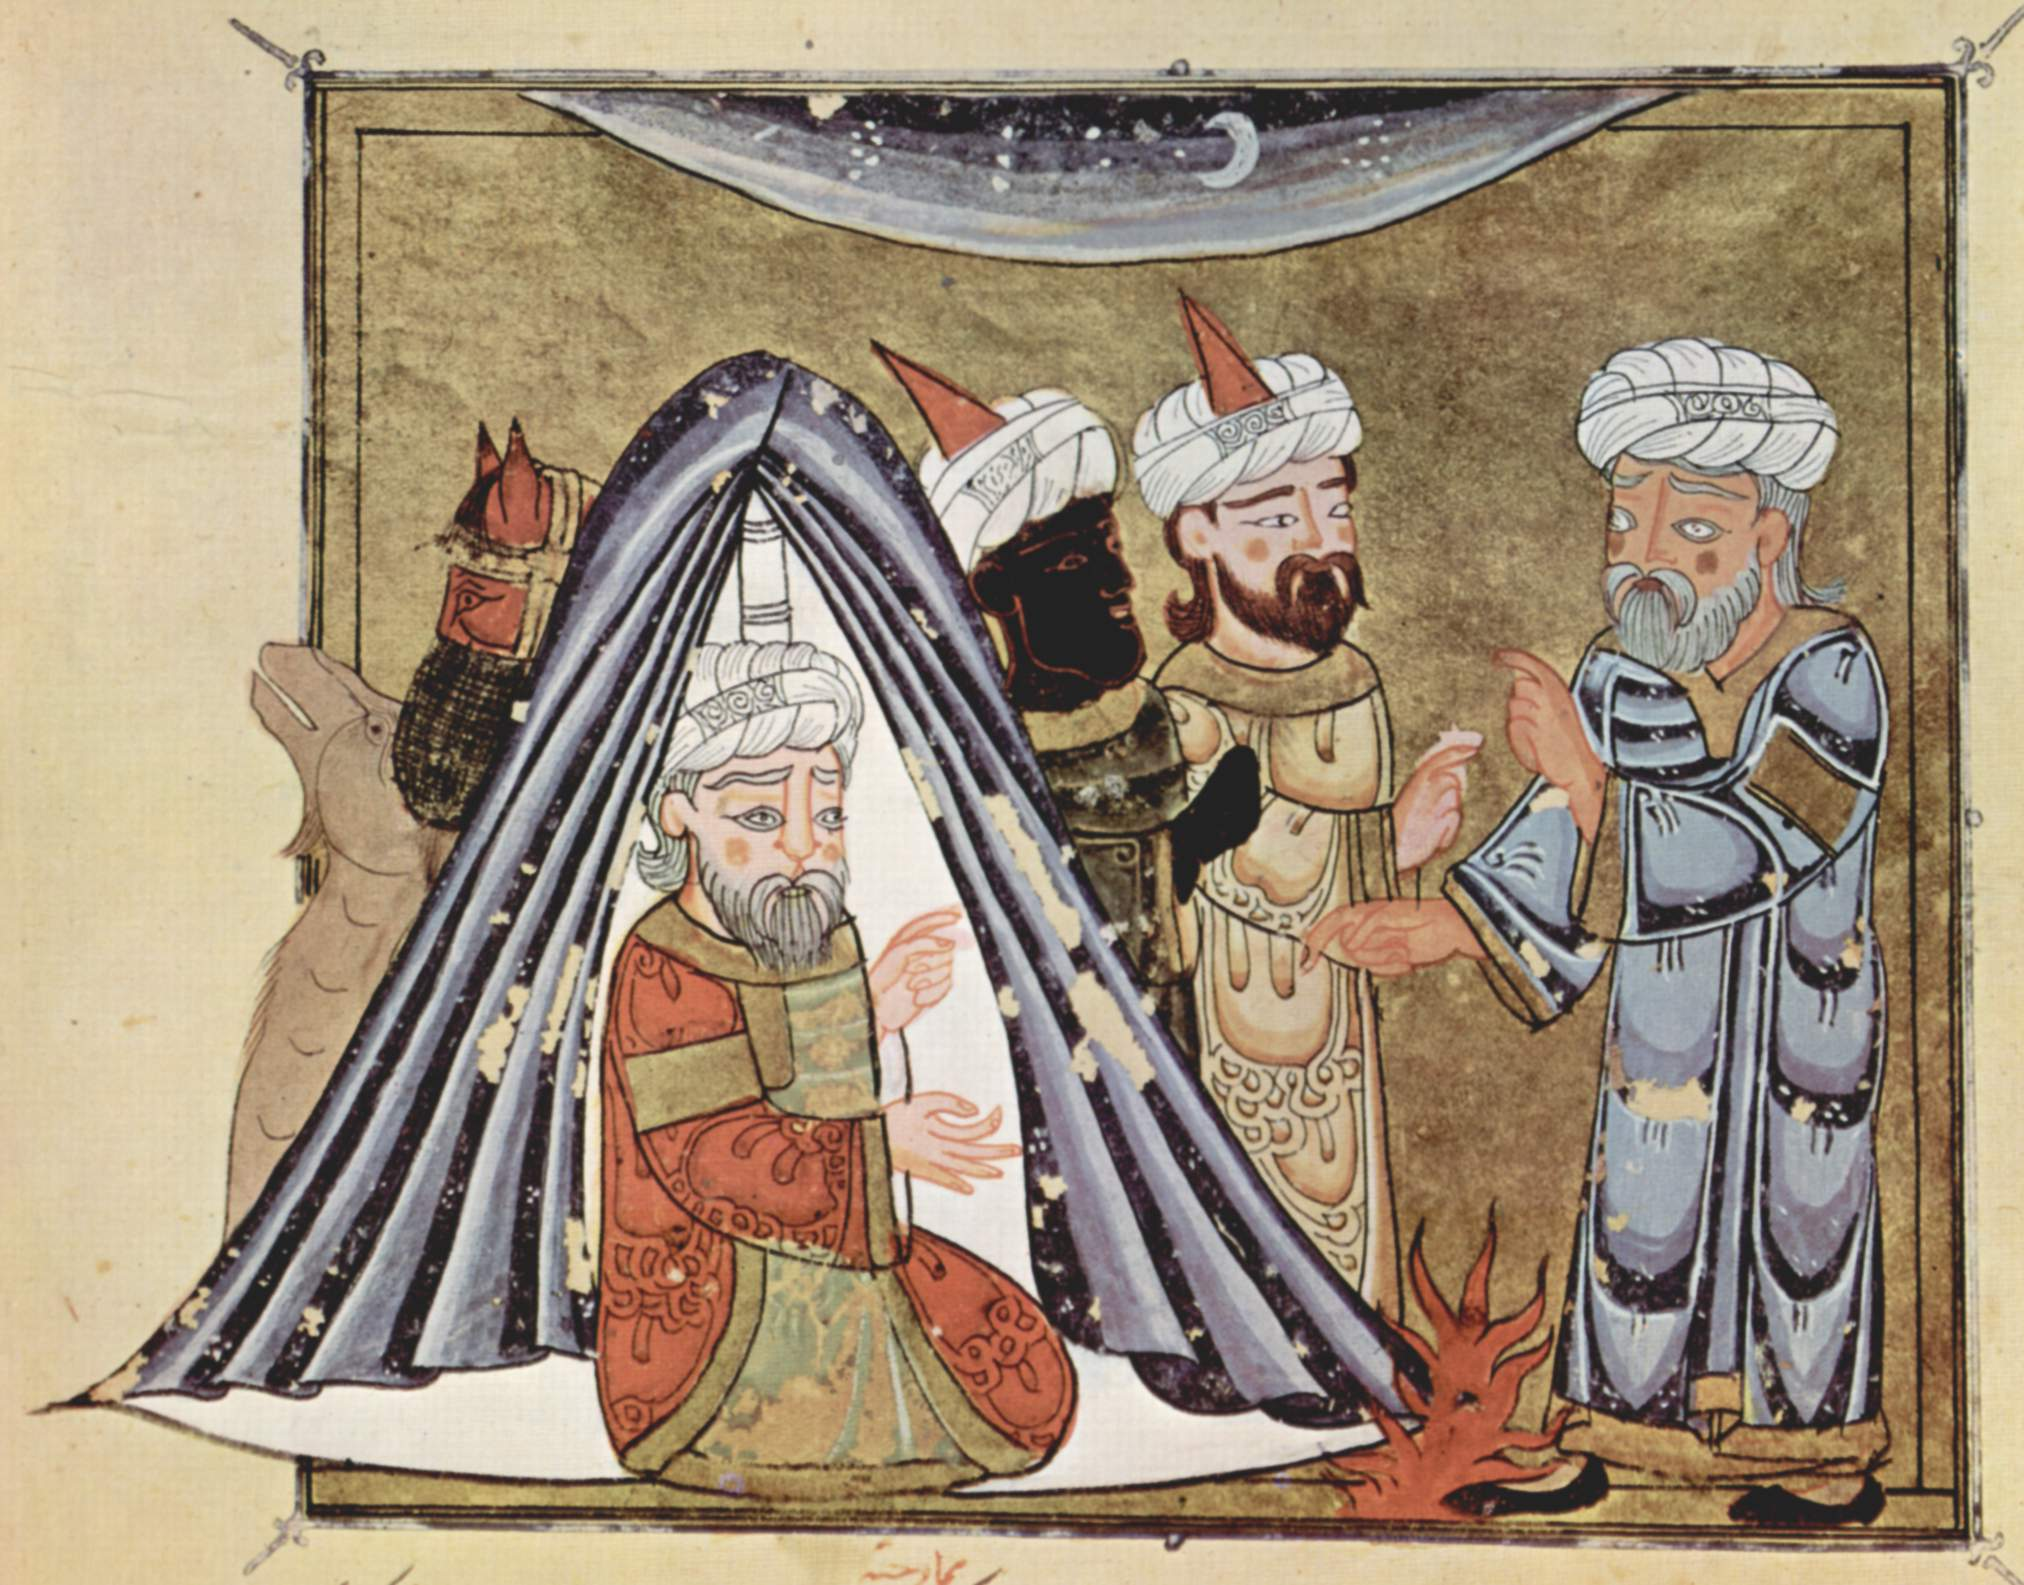 https://i1.wp.com/upload.wikimedia.org/wikipedia/commons/6/6f/Arabischer_Maler_um_1335_003.jpg